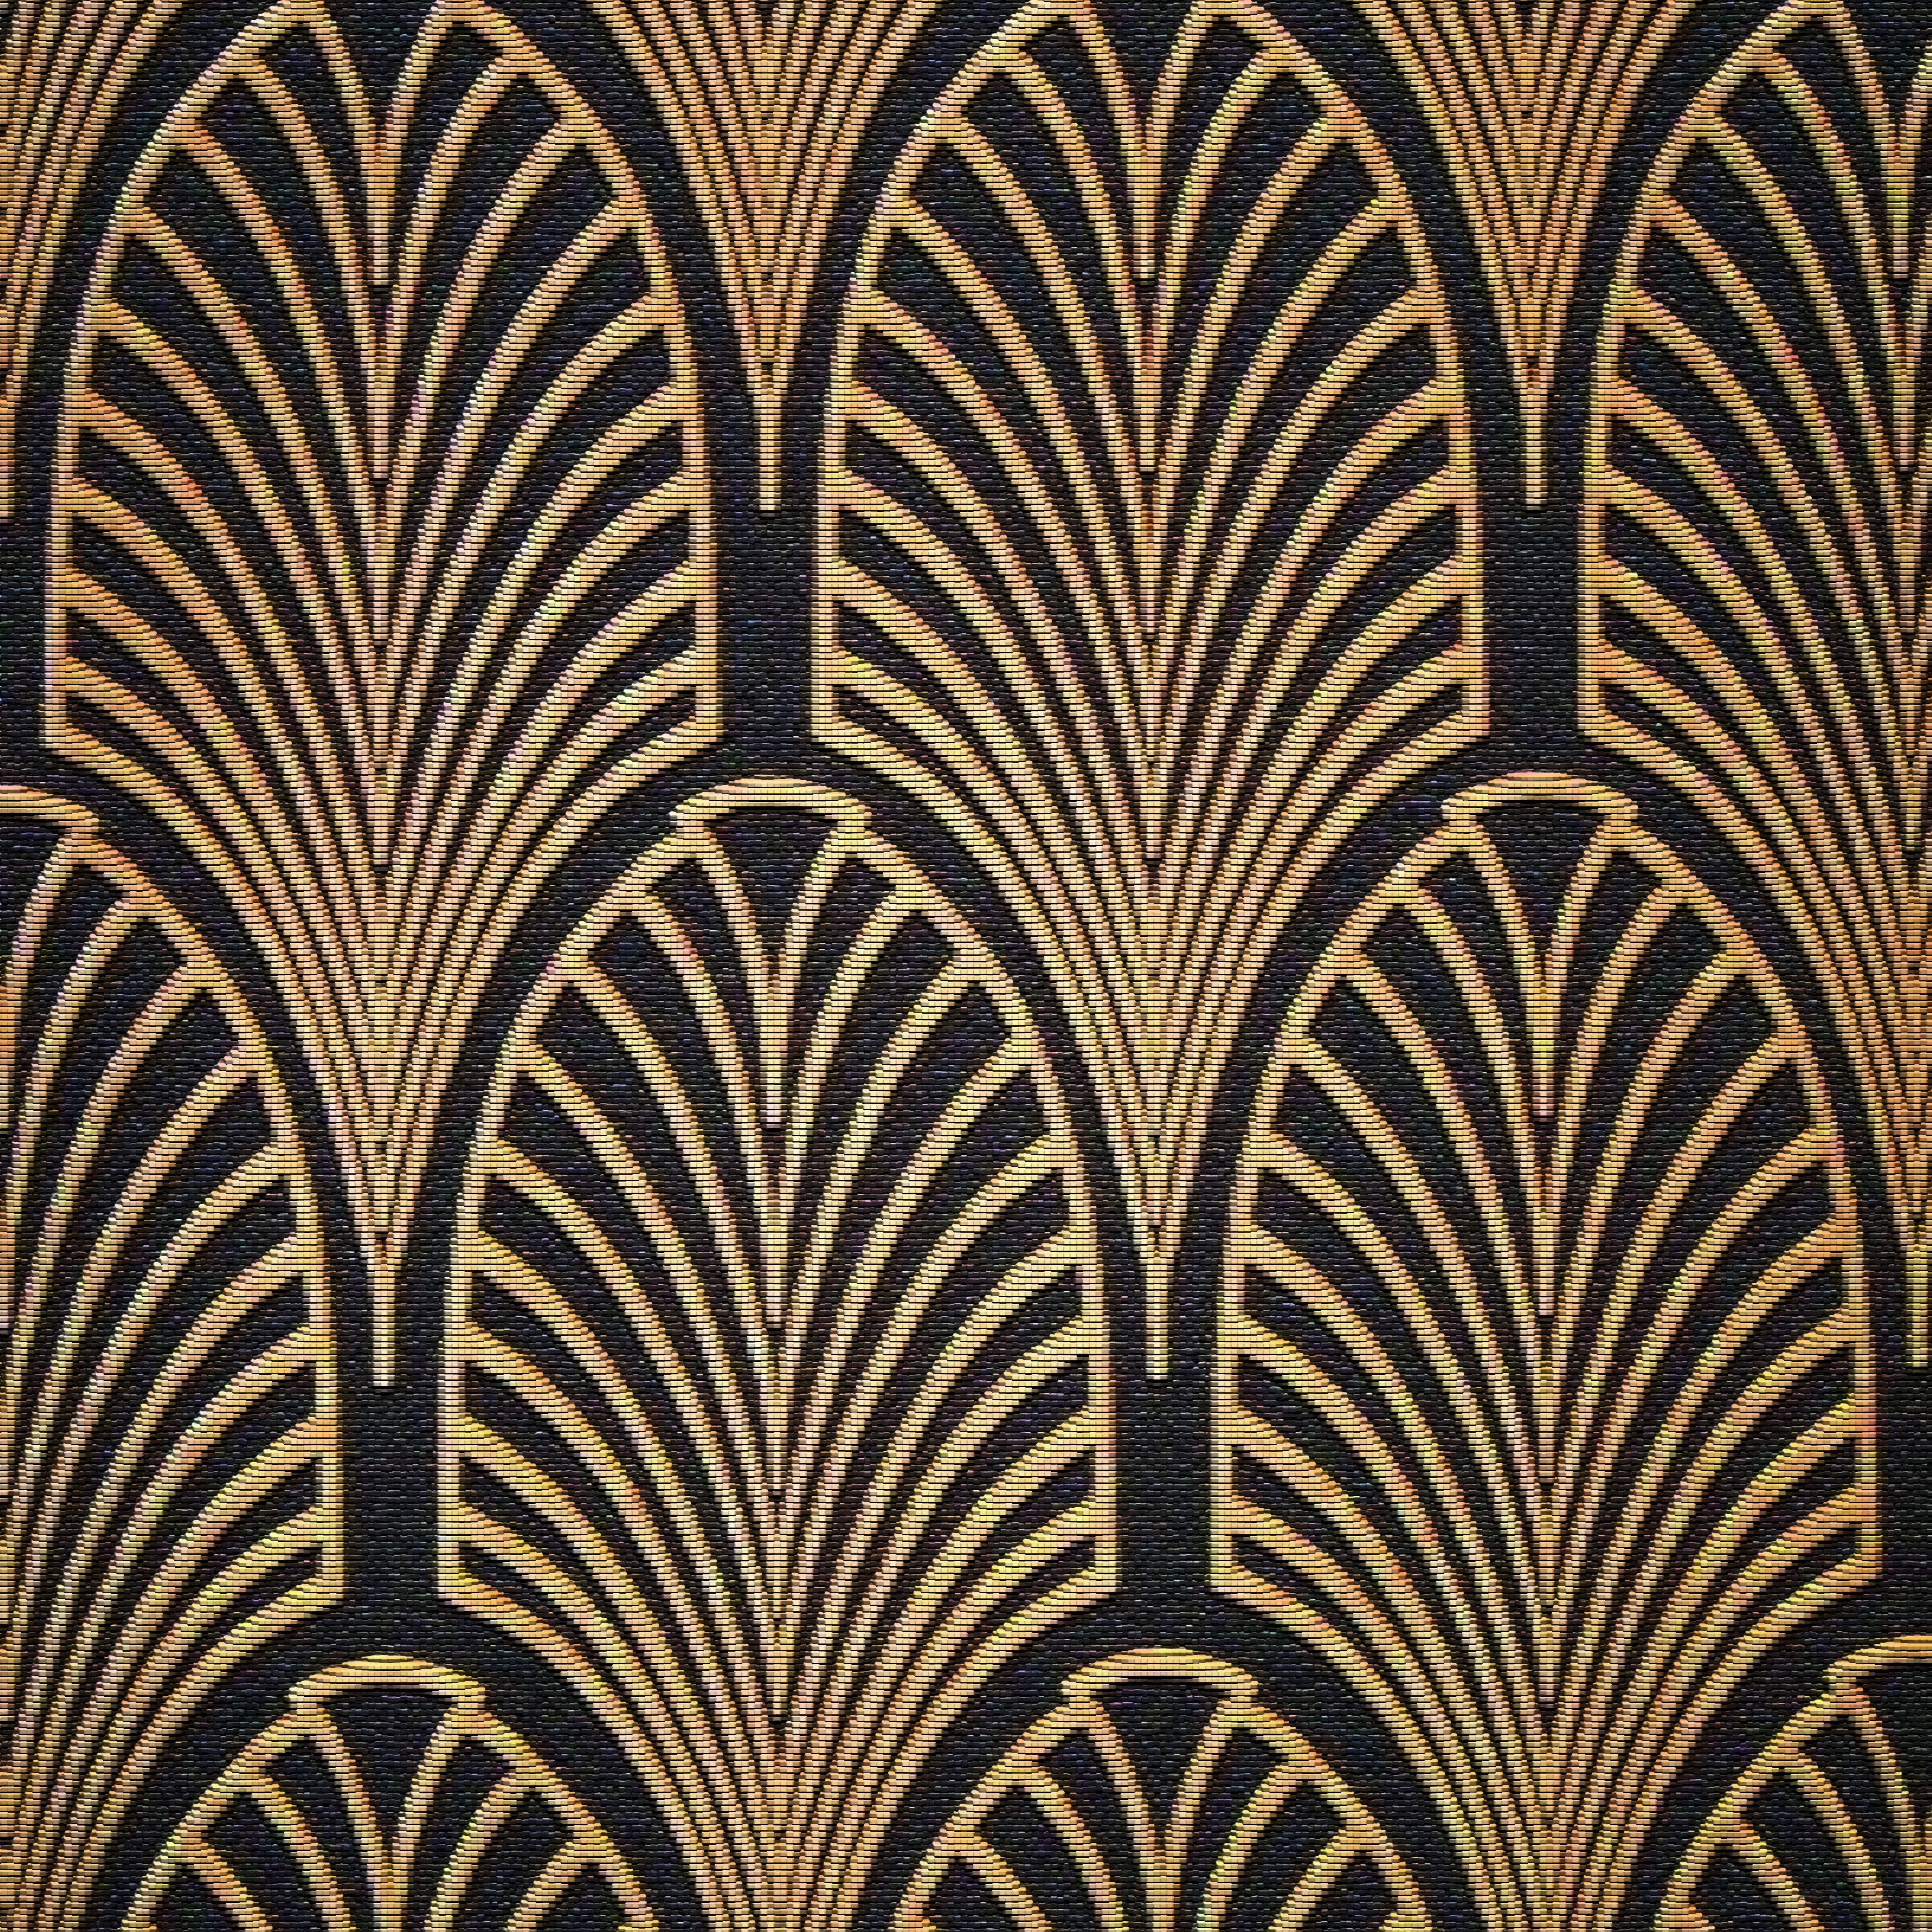 Art Deco Fabric Manipulation Art Deco Fabric Art Deco Pattern Art Deco Wallpaper